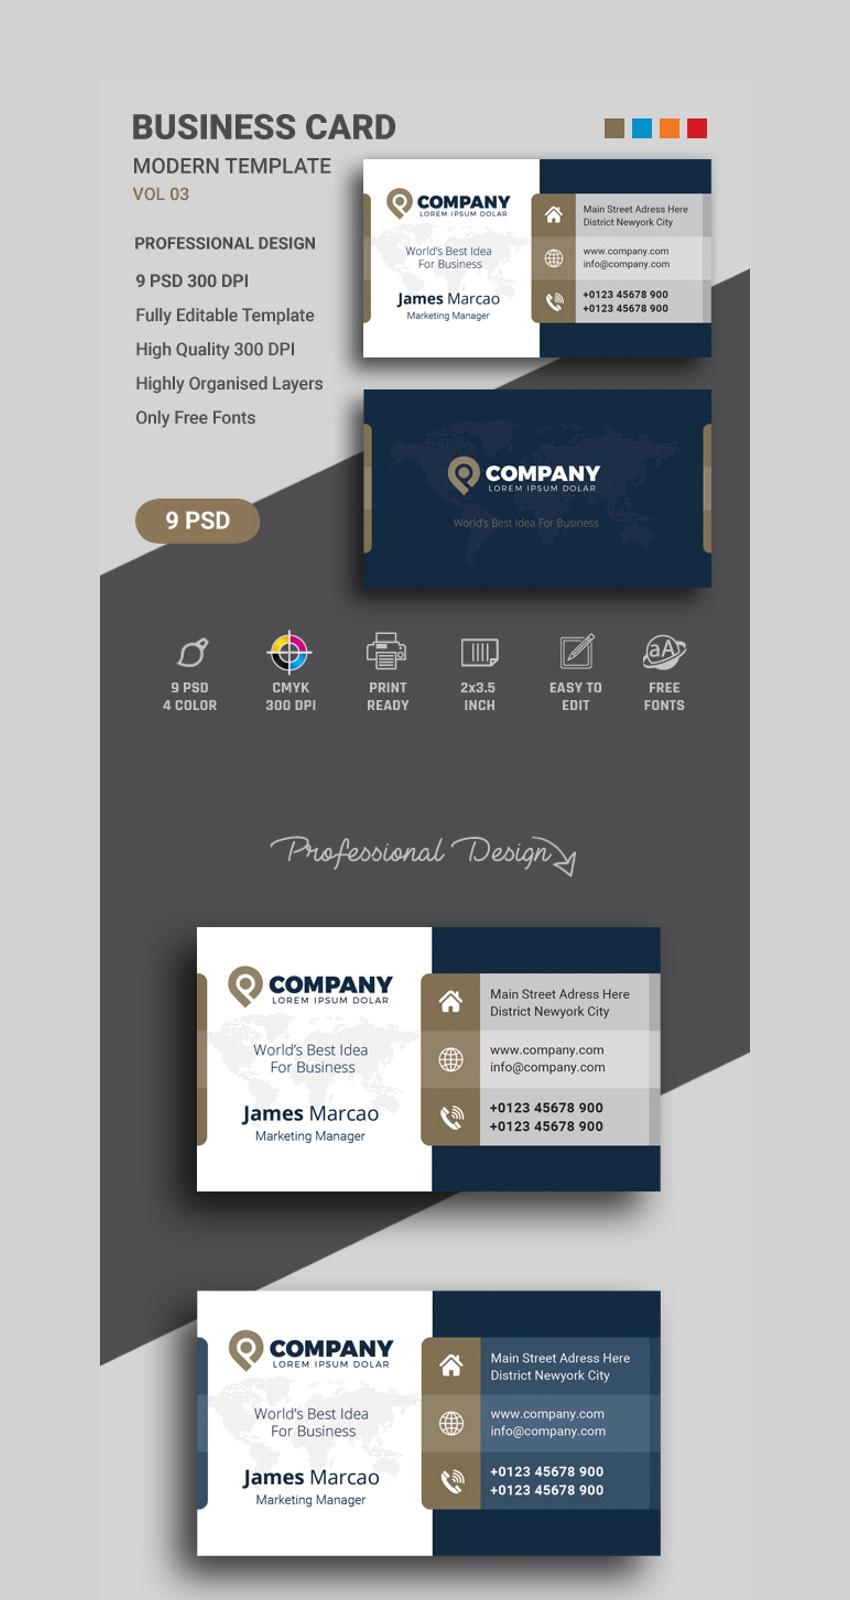 Business Card Template - Contemporary Business Card Design